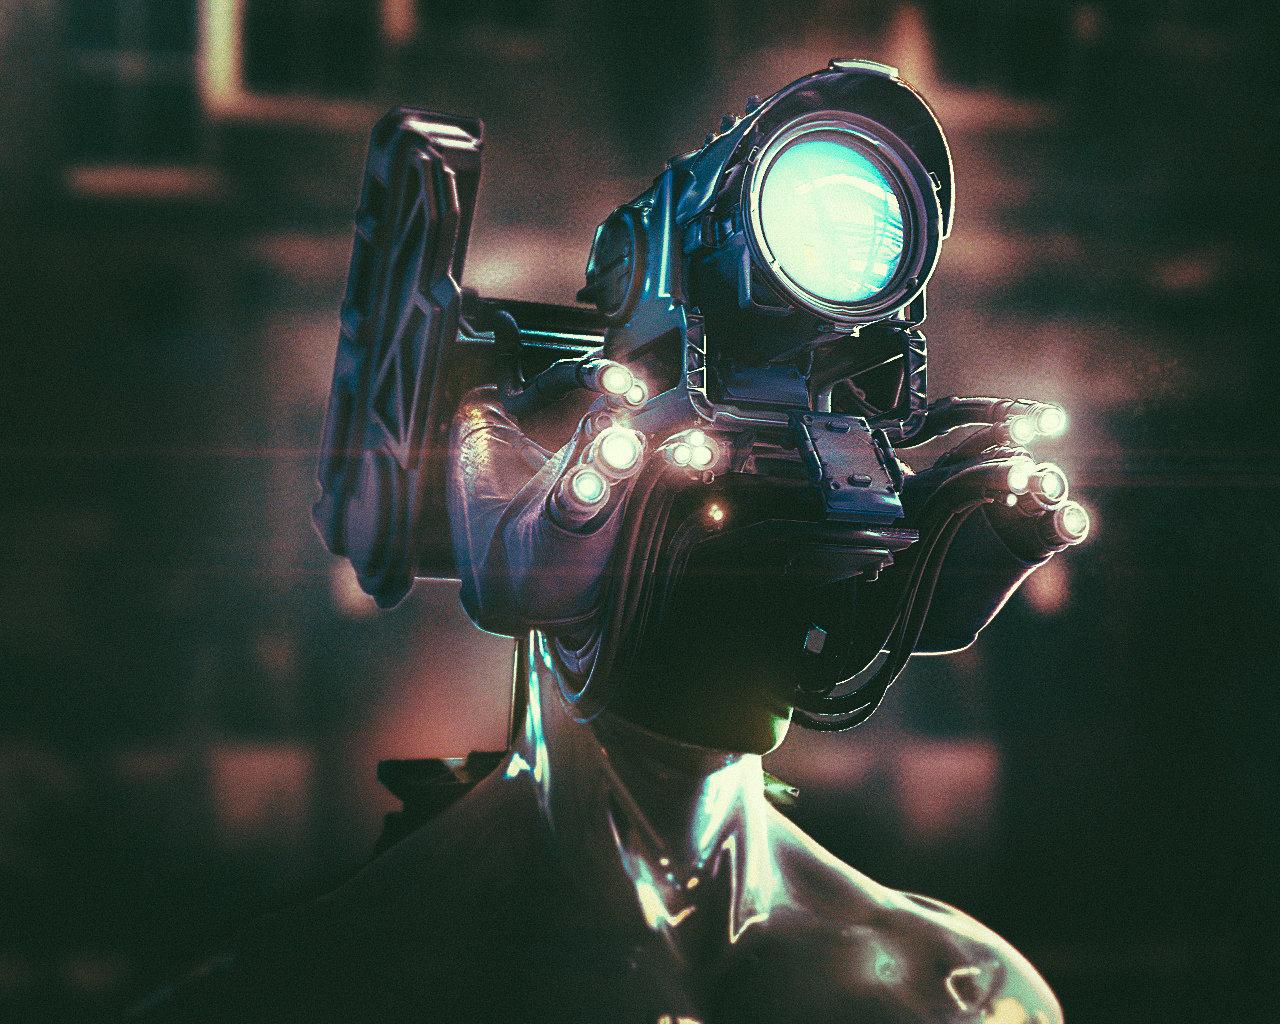 steve-teeps-kit-bash-helm-cyclops-cc-1.jpg